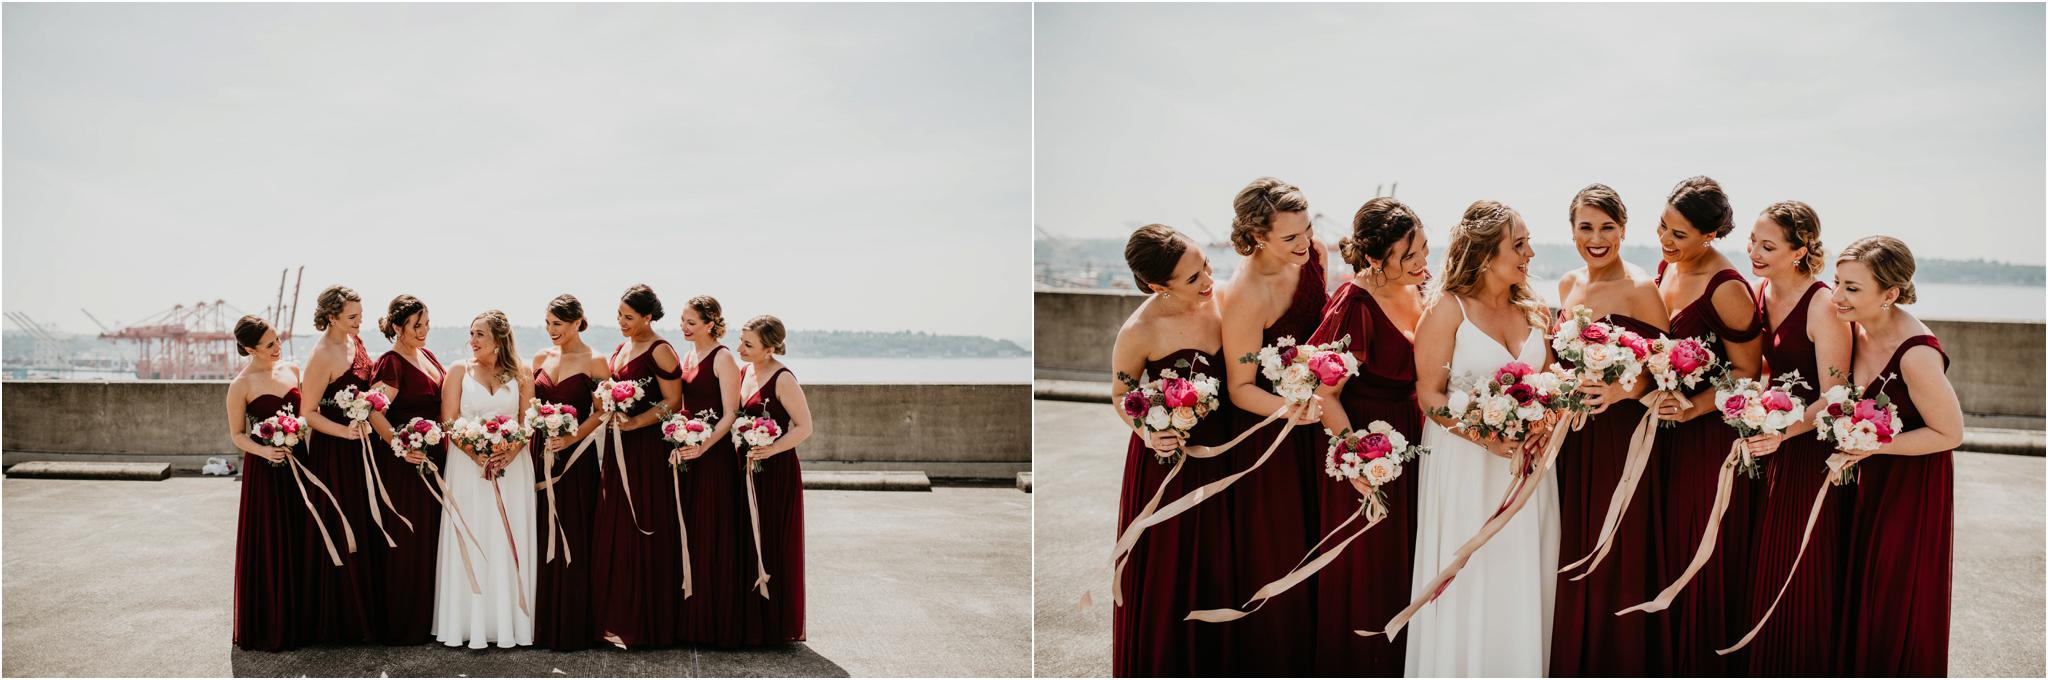 laura-and-matt-metropolist-urban-seattle-wedding-photographer-048.jpg